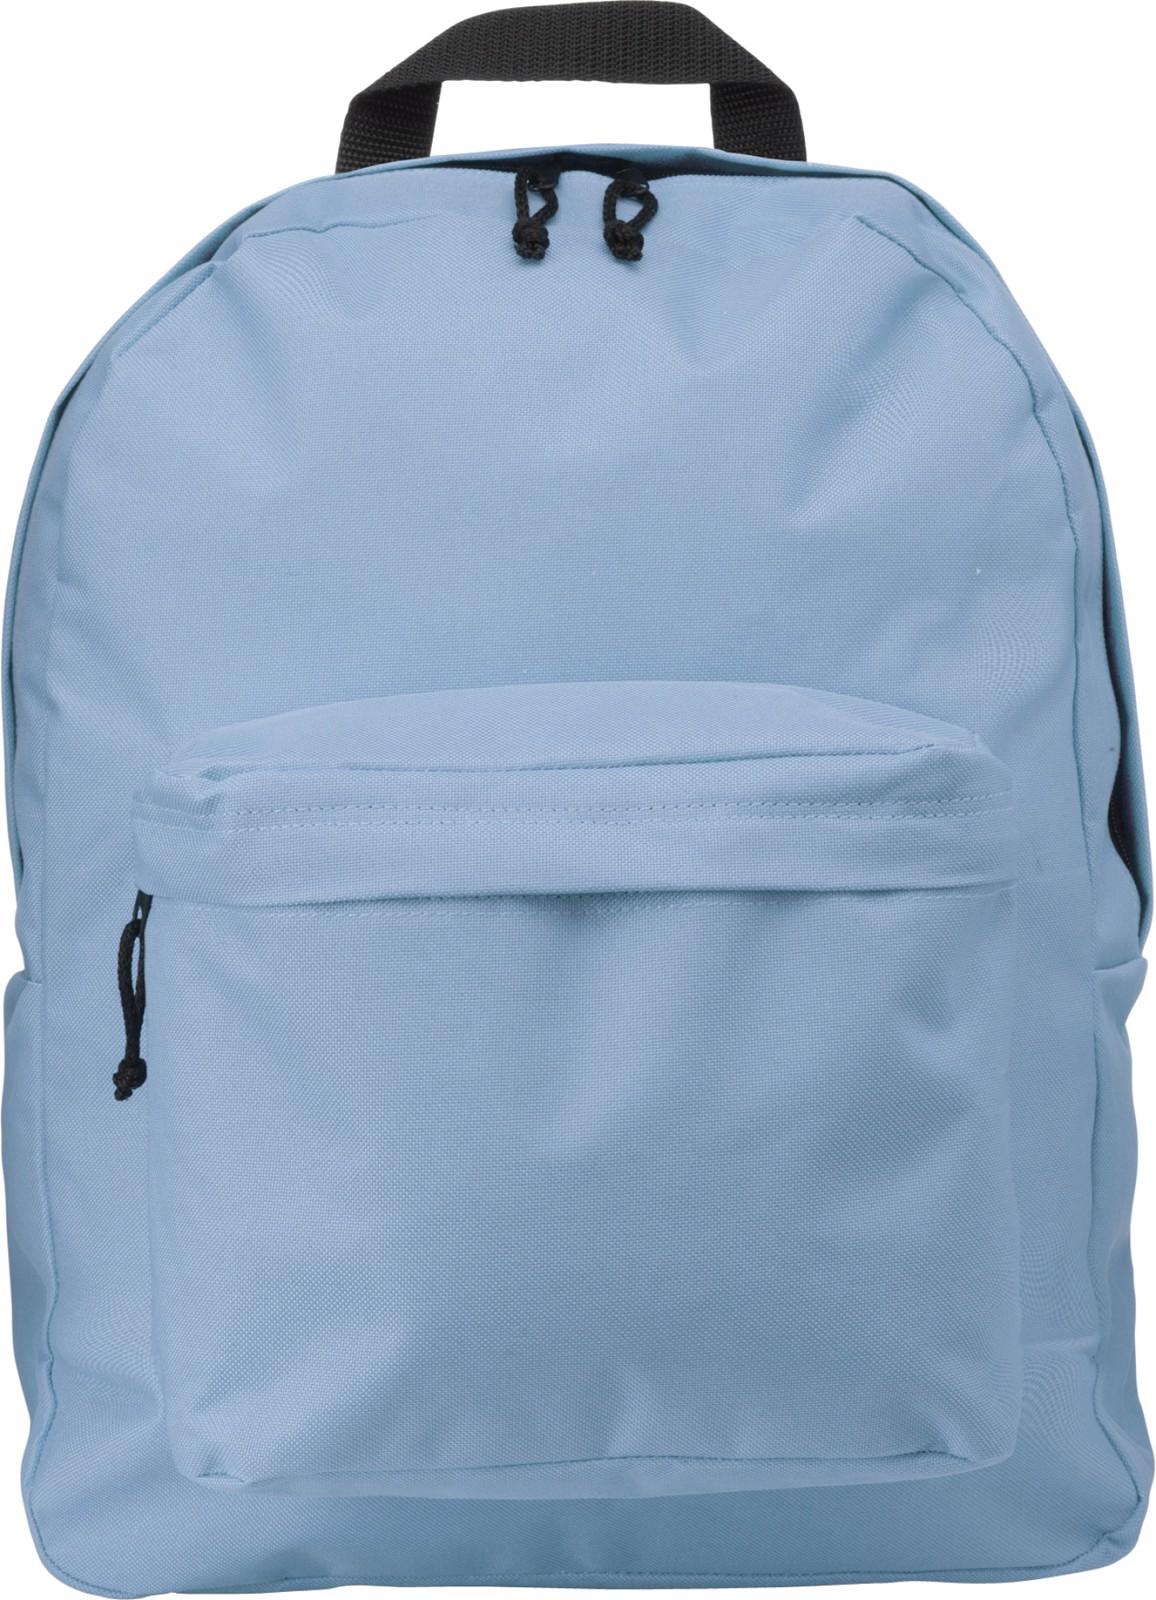 Polyester (600D) backpack - Light Blue